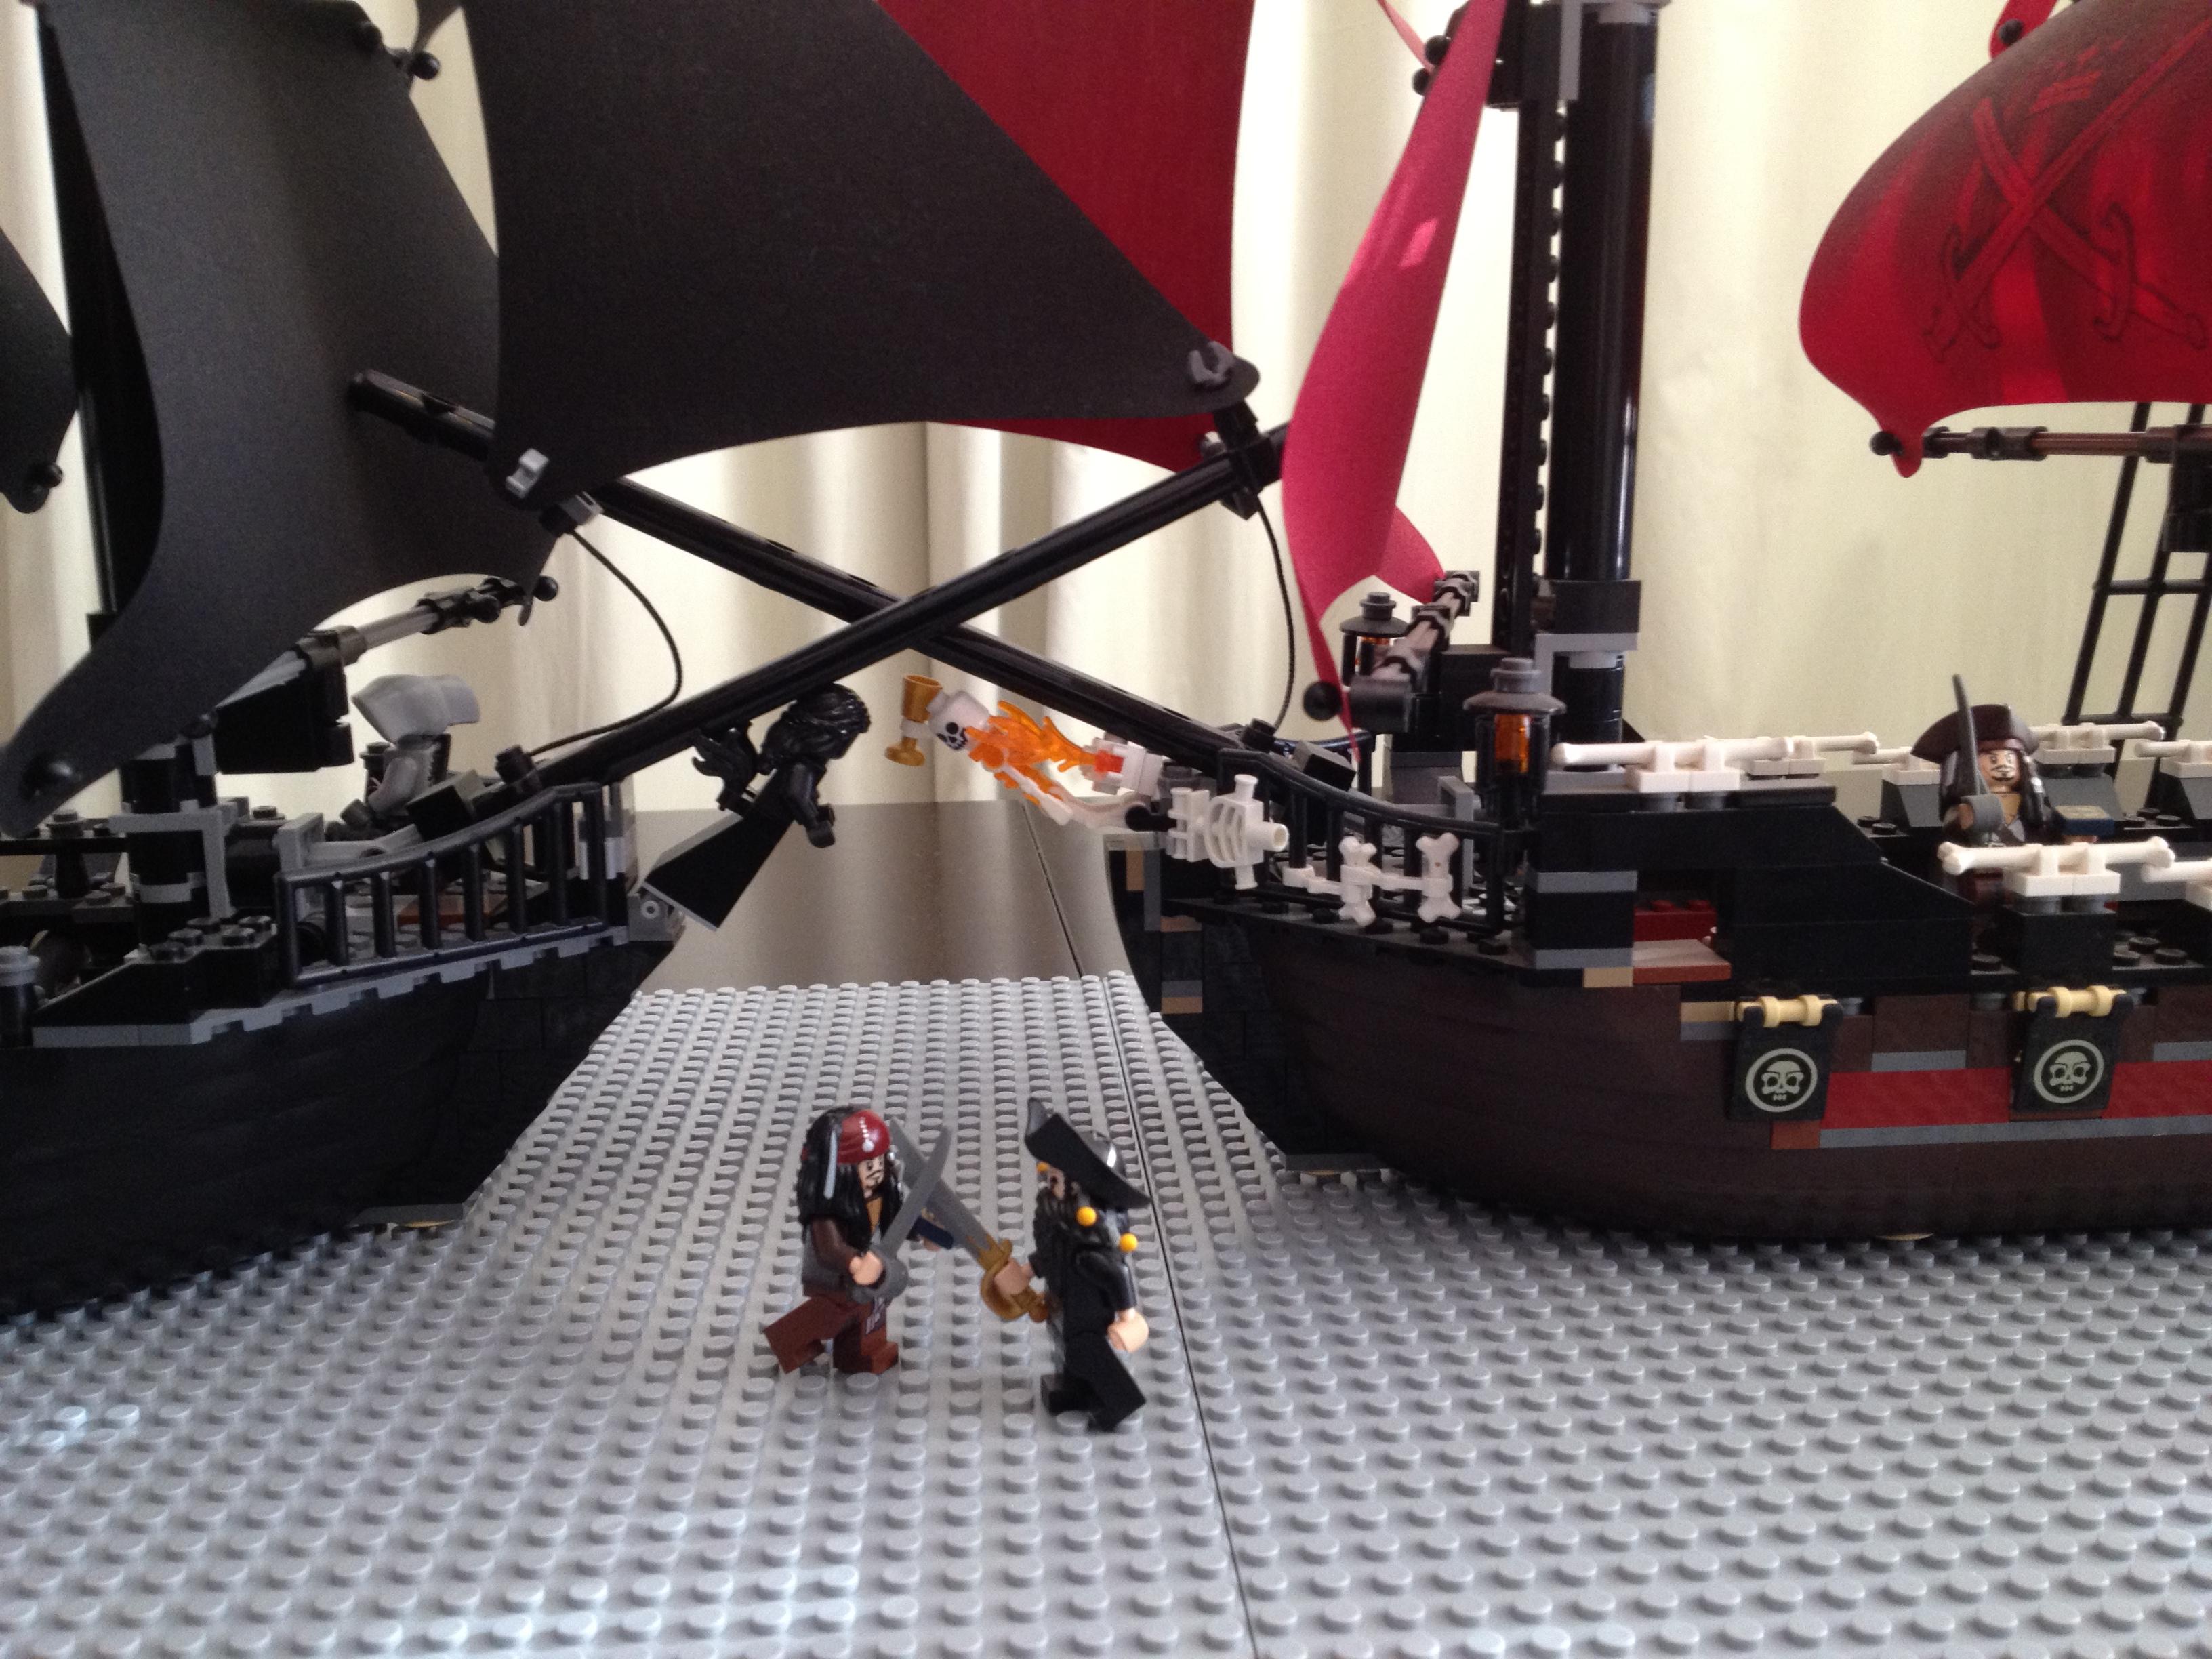 Black Pearl 4184 V S Queen Anne S Revenge 4195 Quién Reina El Océano De Lego